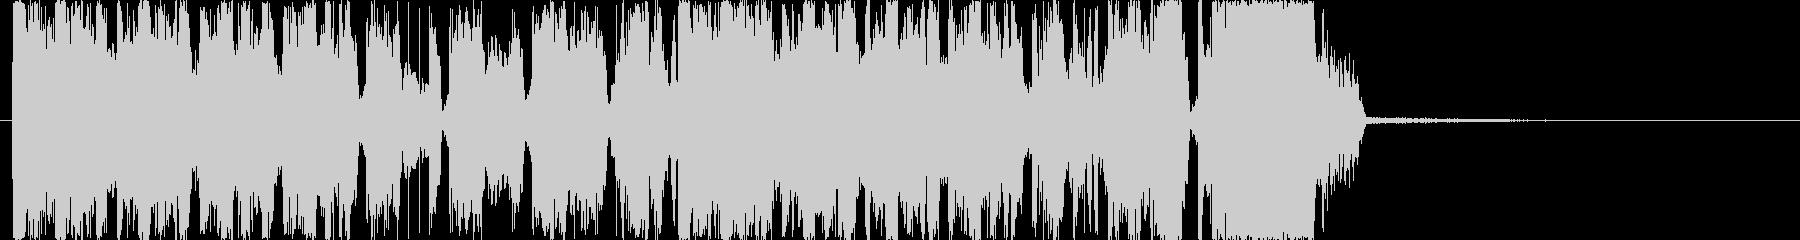 CMやラジオなどのジングルにの未再生の波形